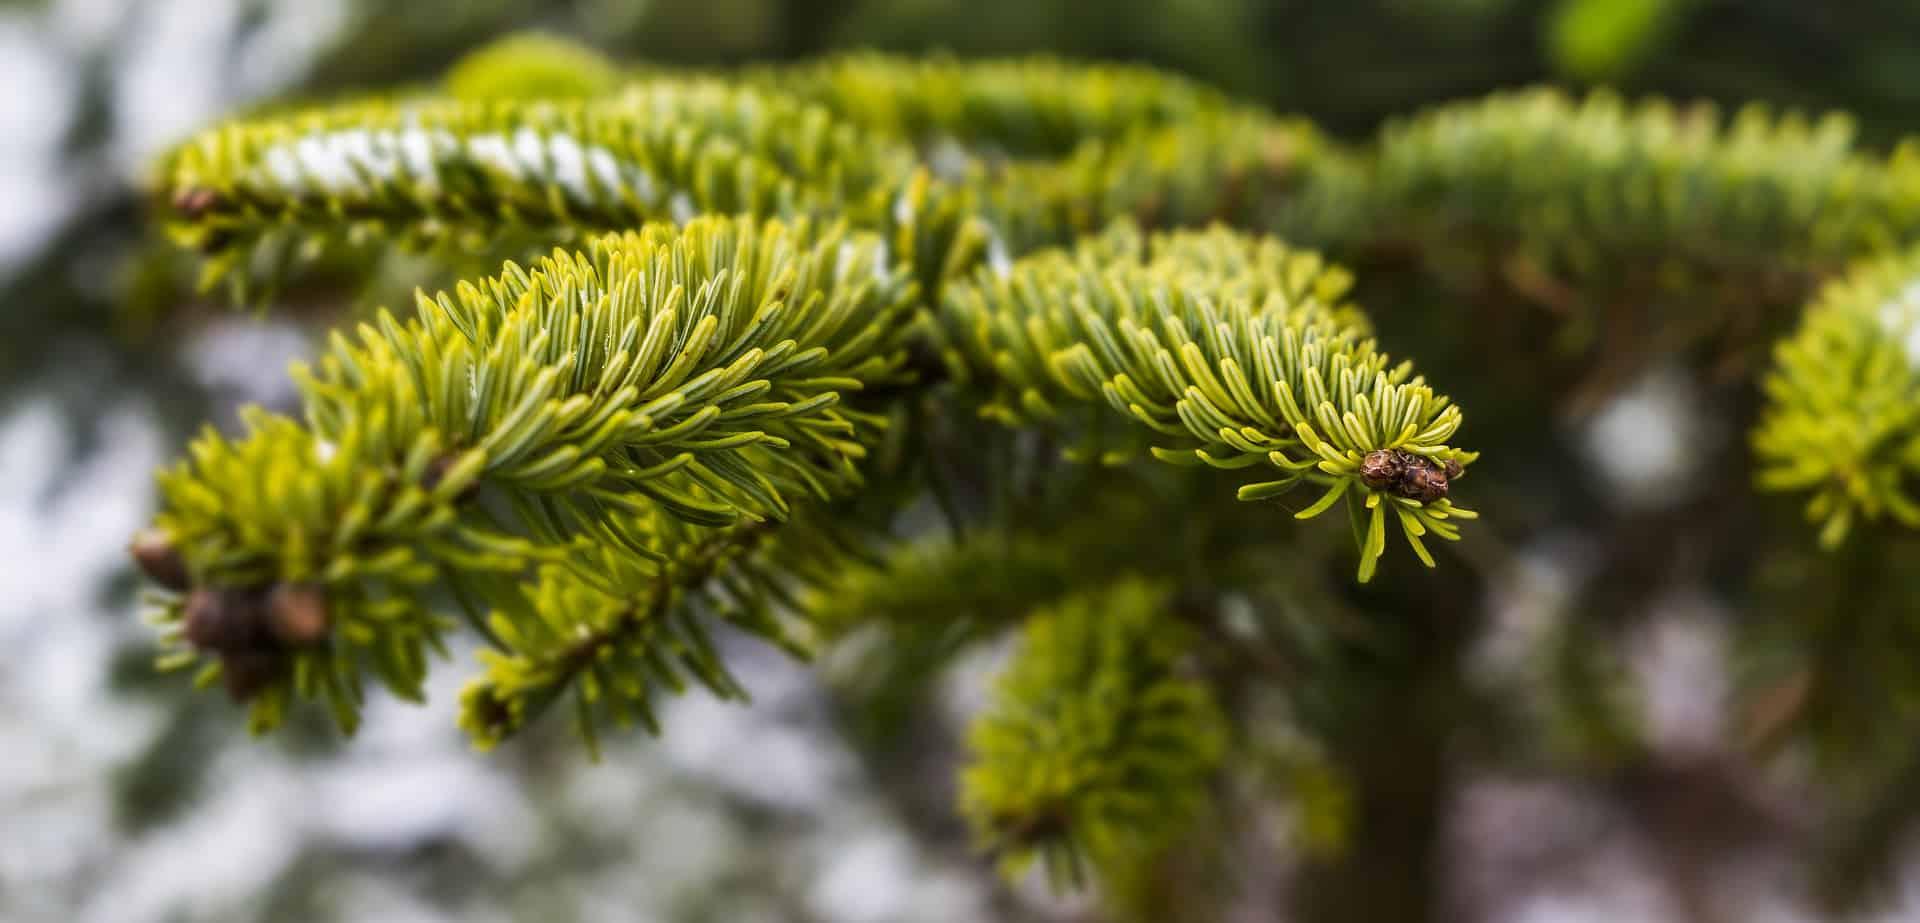 Christmas Tree Allergy: Can an Air Purifier Help? - US Air Purifiers